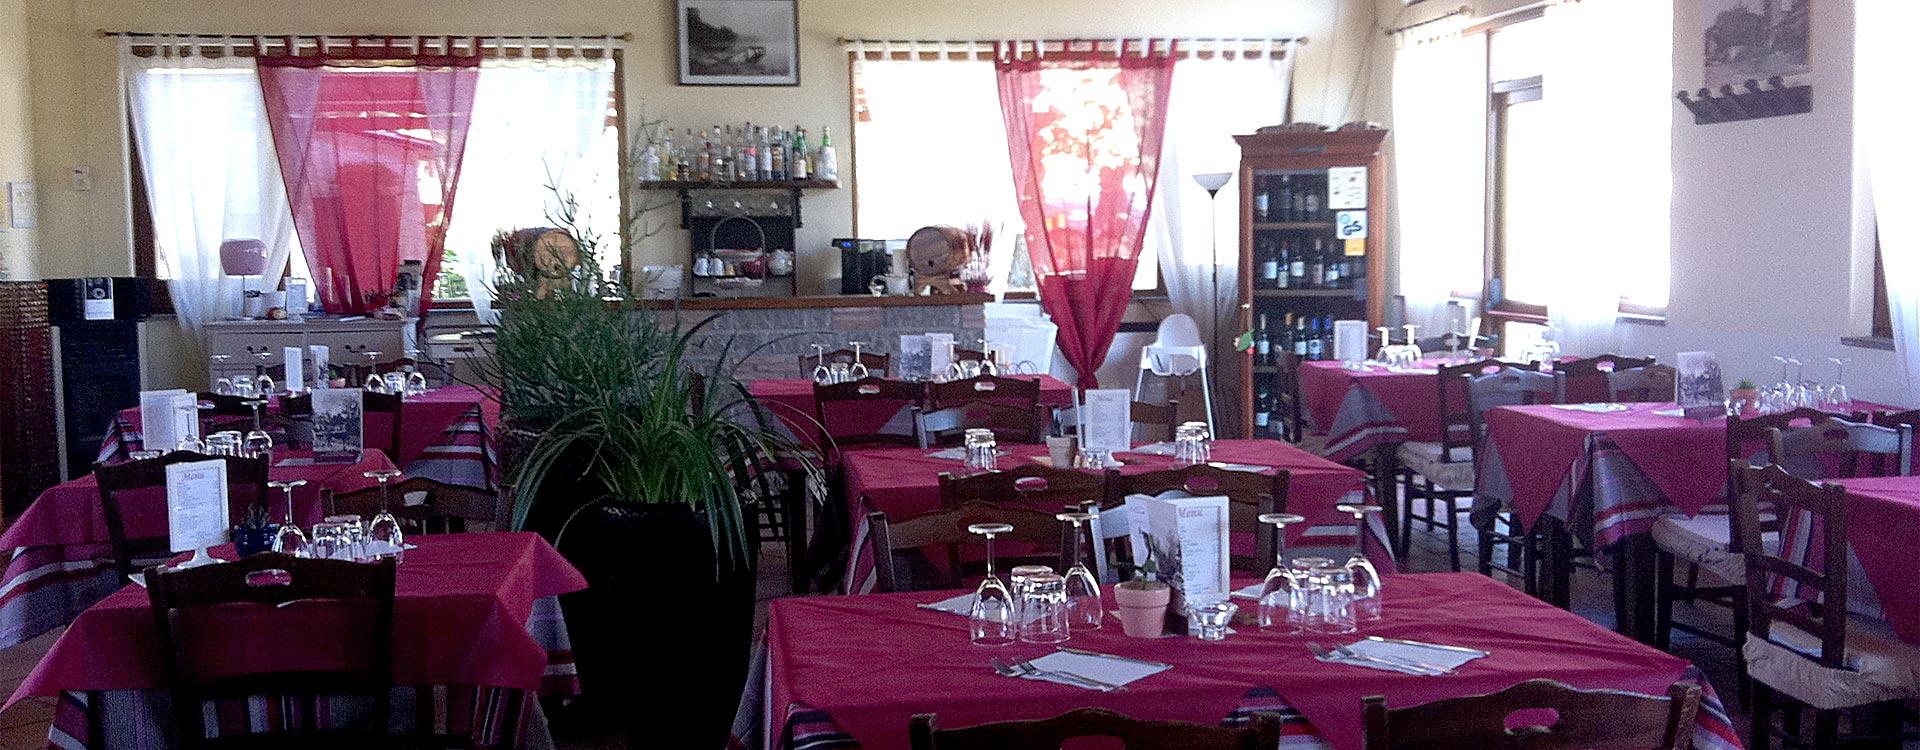 La Sala del ristorante Acquaranda